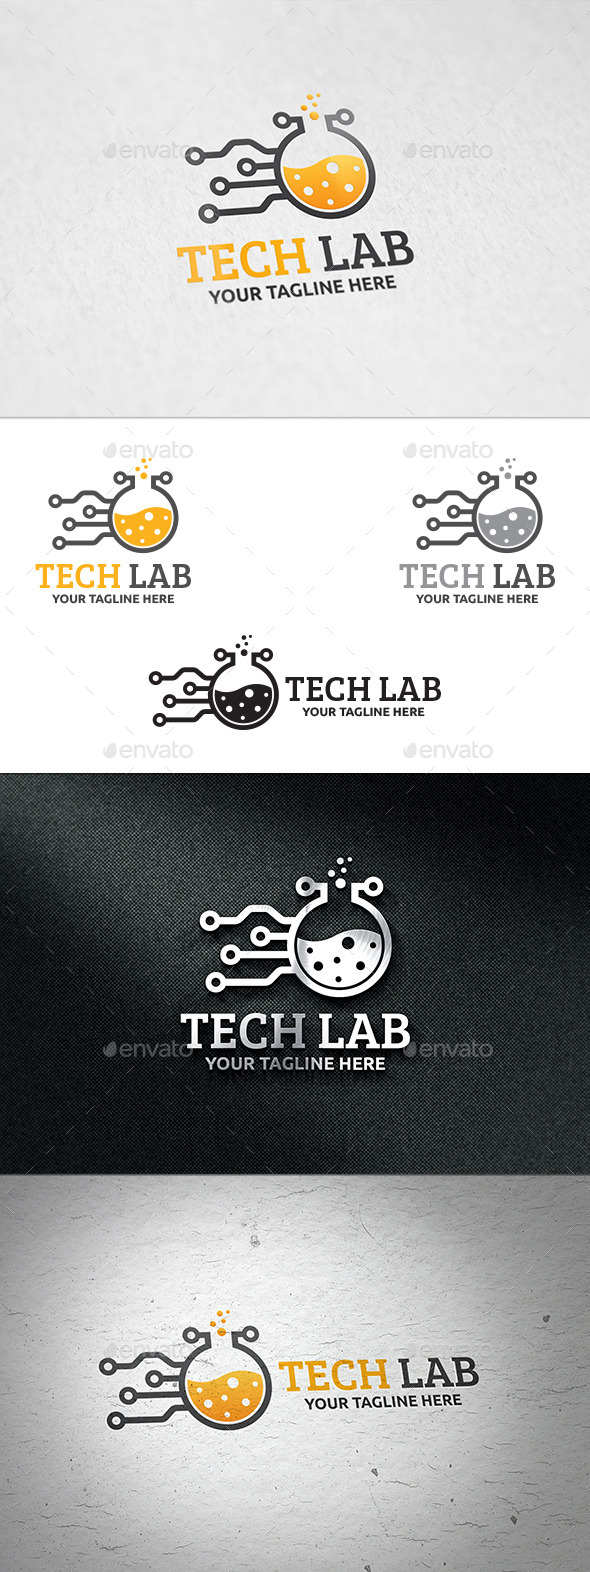 GraphicRiver Tech Lab Logo Template 11041490